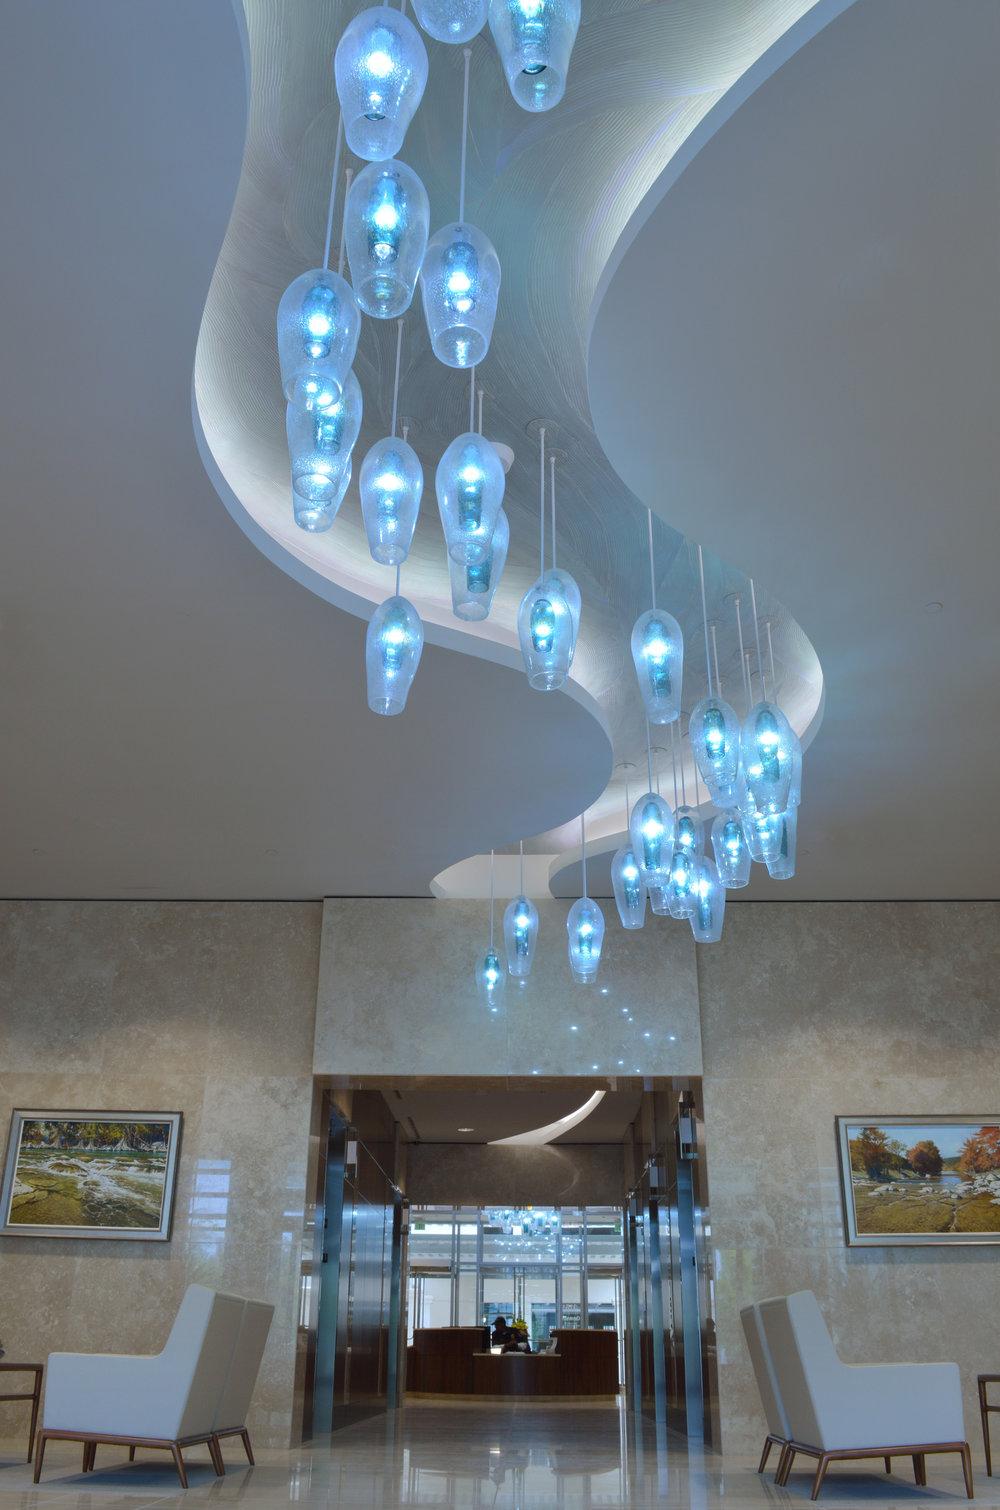 Wimberley Glassworks Briarpark Houston Blown Glass Lighting Installation through lobby shot for web (2).jpg